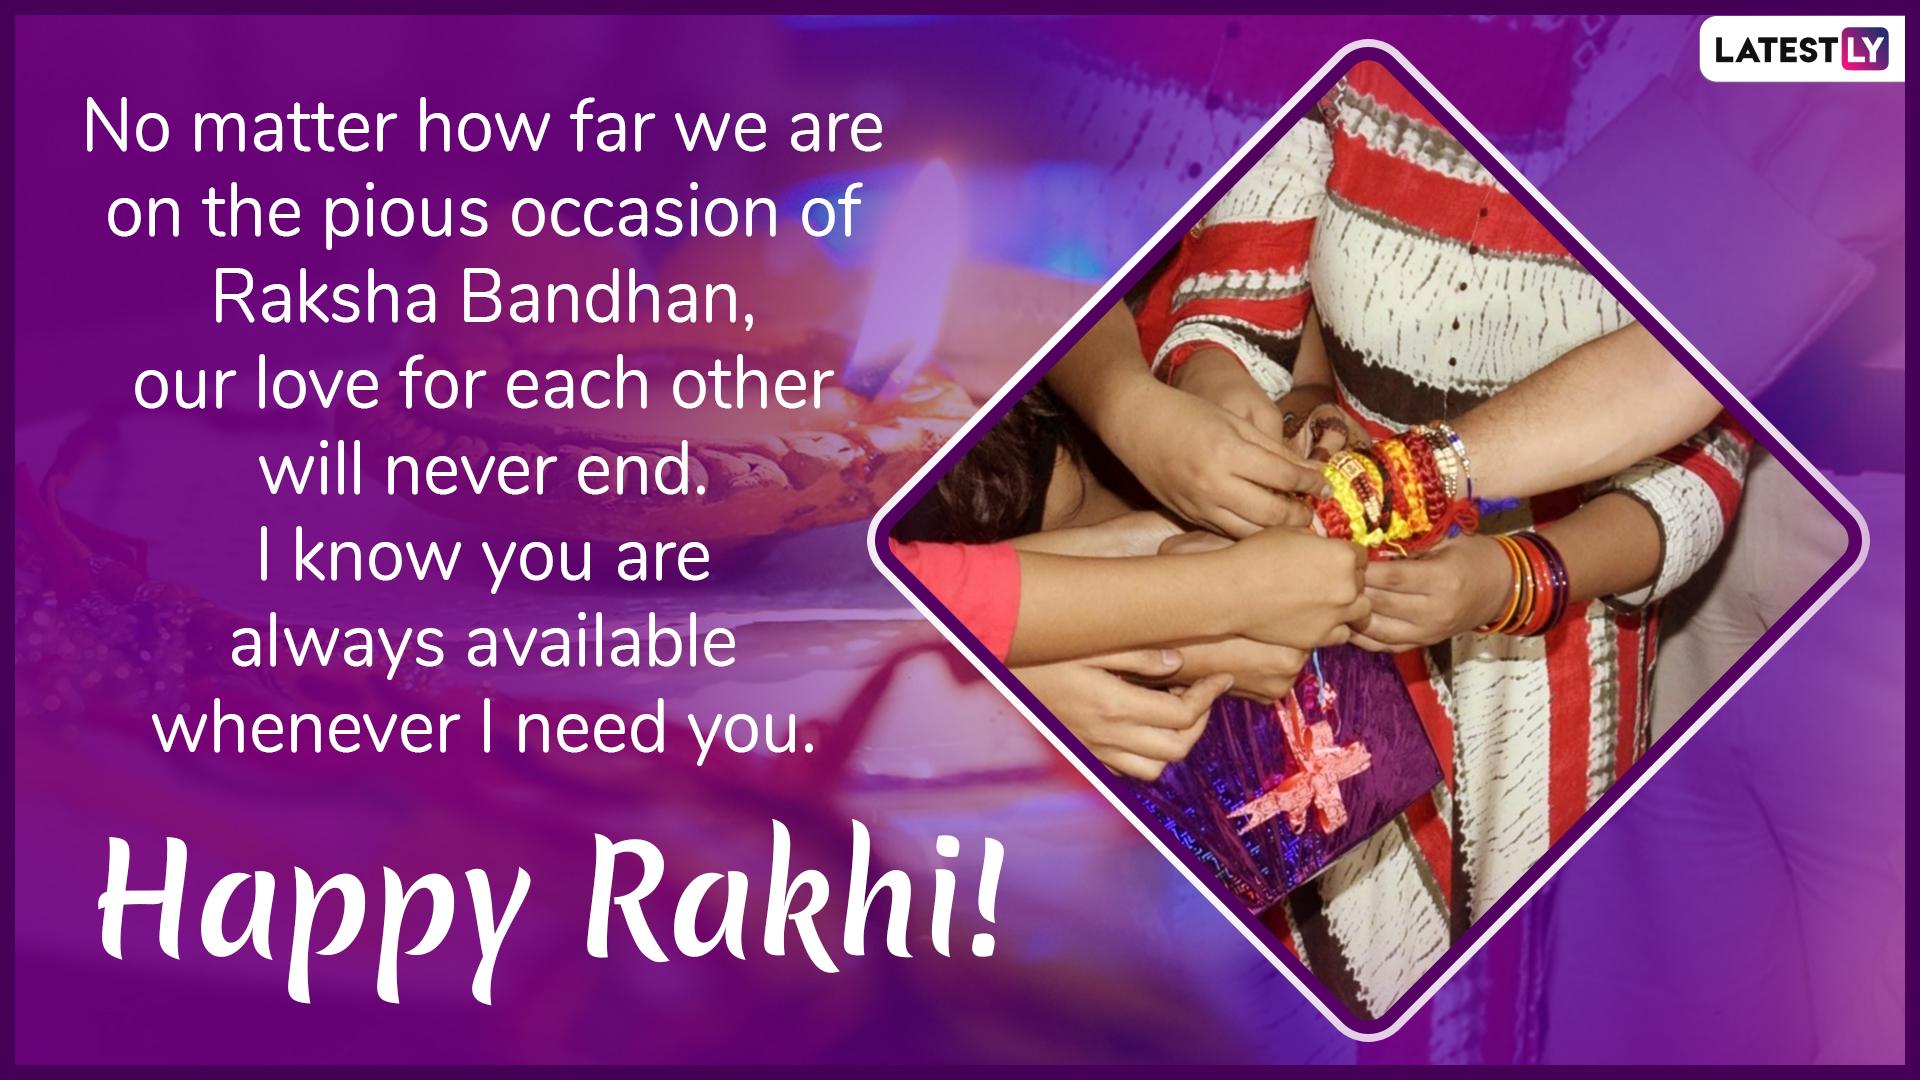 Raksha Bandhan 2019 greeting card for download 1 (Photo Credits: File Image)